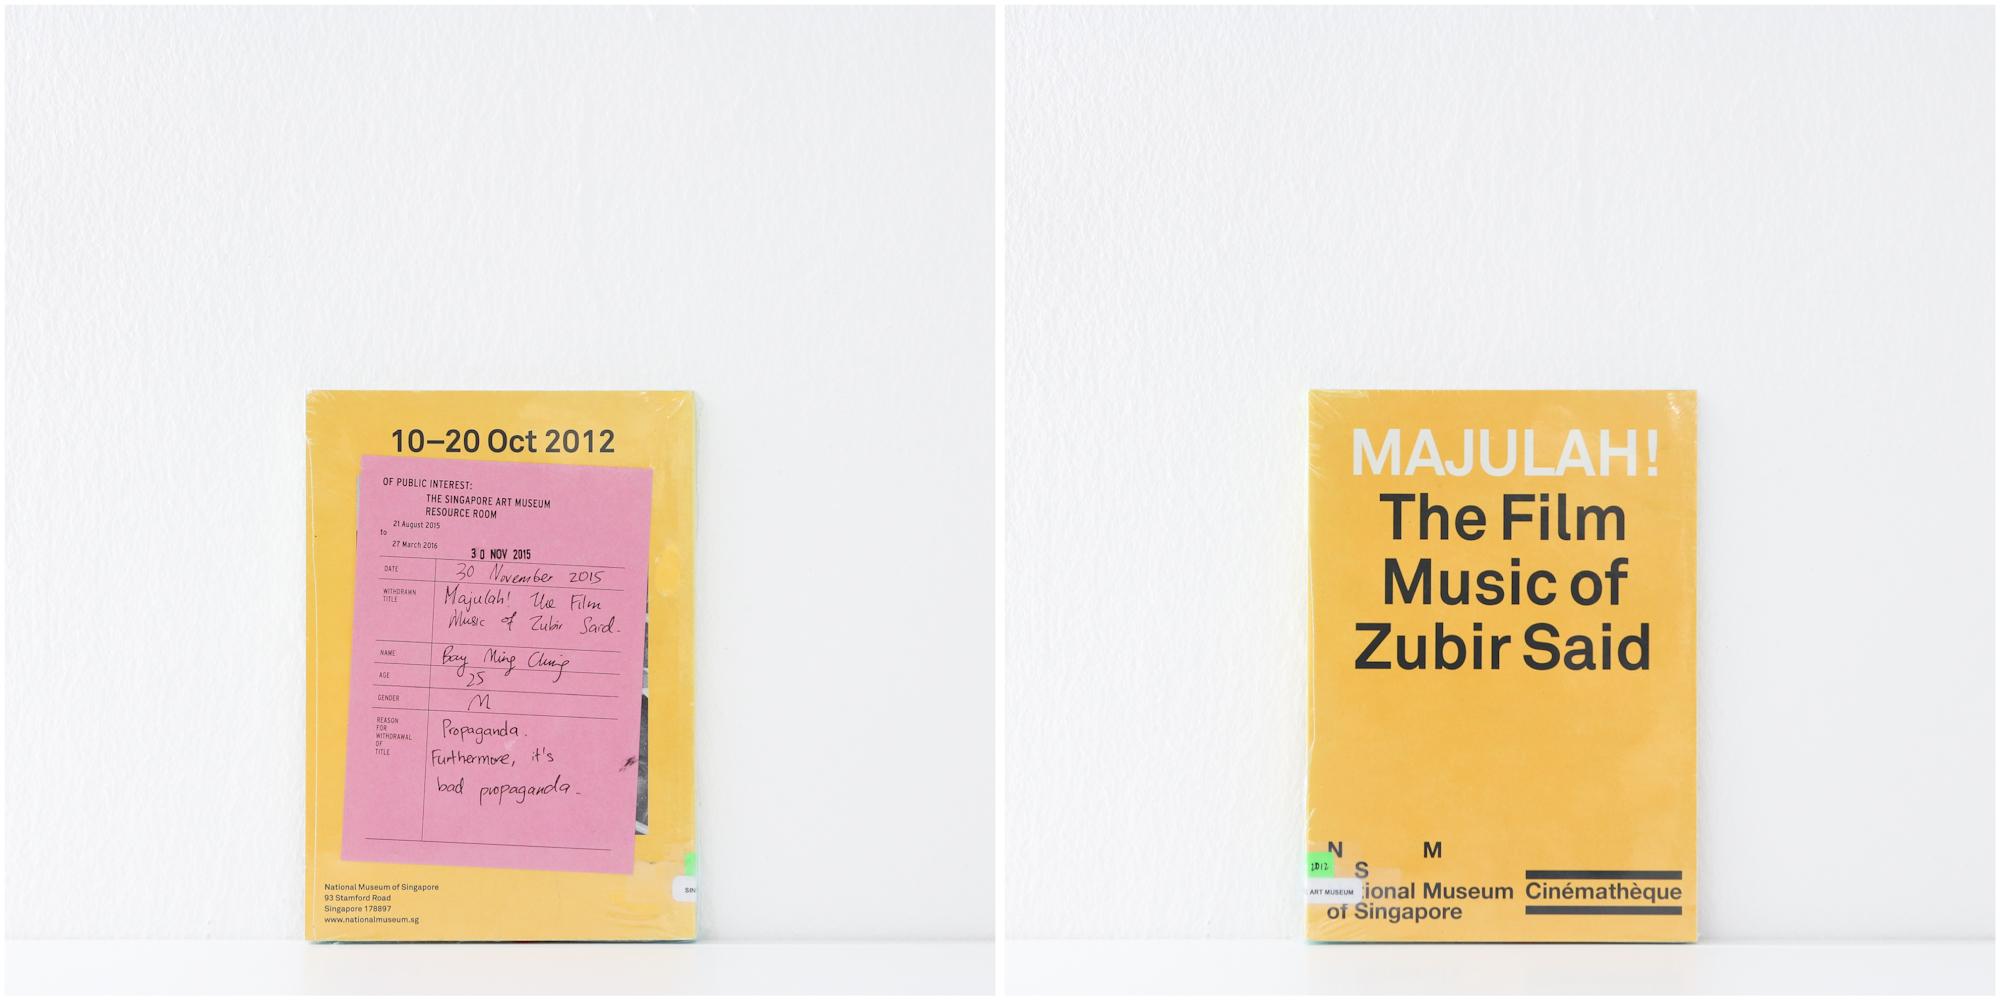 'Majulah! The Film Music of Zubir Said', 30/11/15, Bay Ming Ching, 25, Male